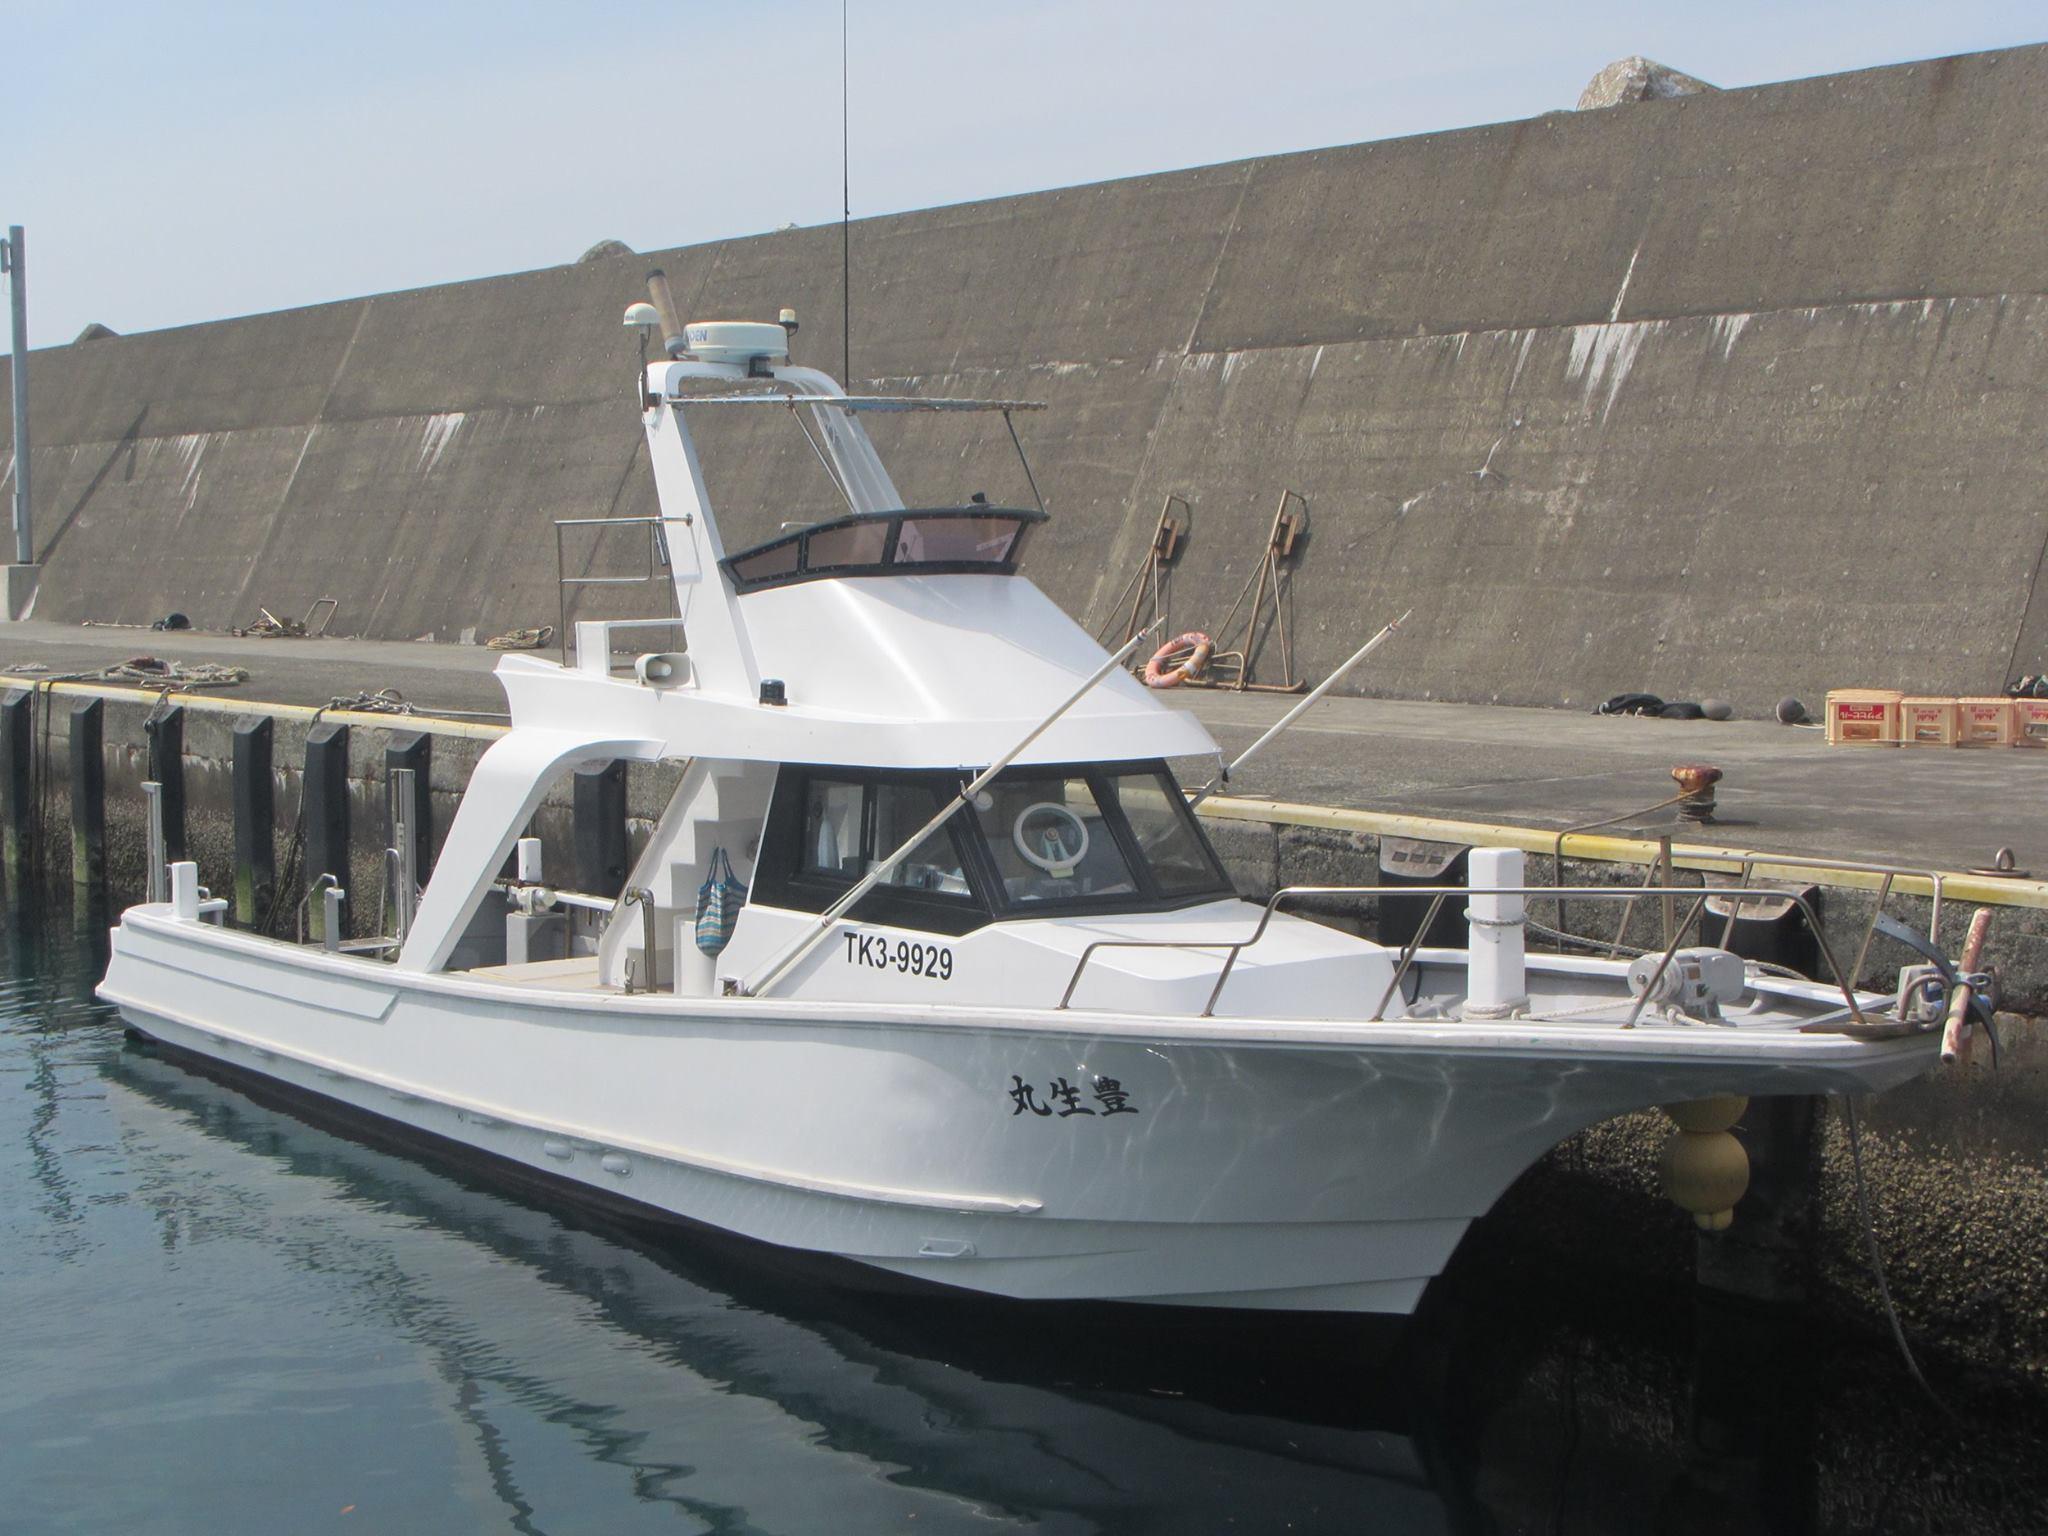 竹芝発 東海汽船(ジェット船) 利島  最大4ダイブ付 3日間4